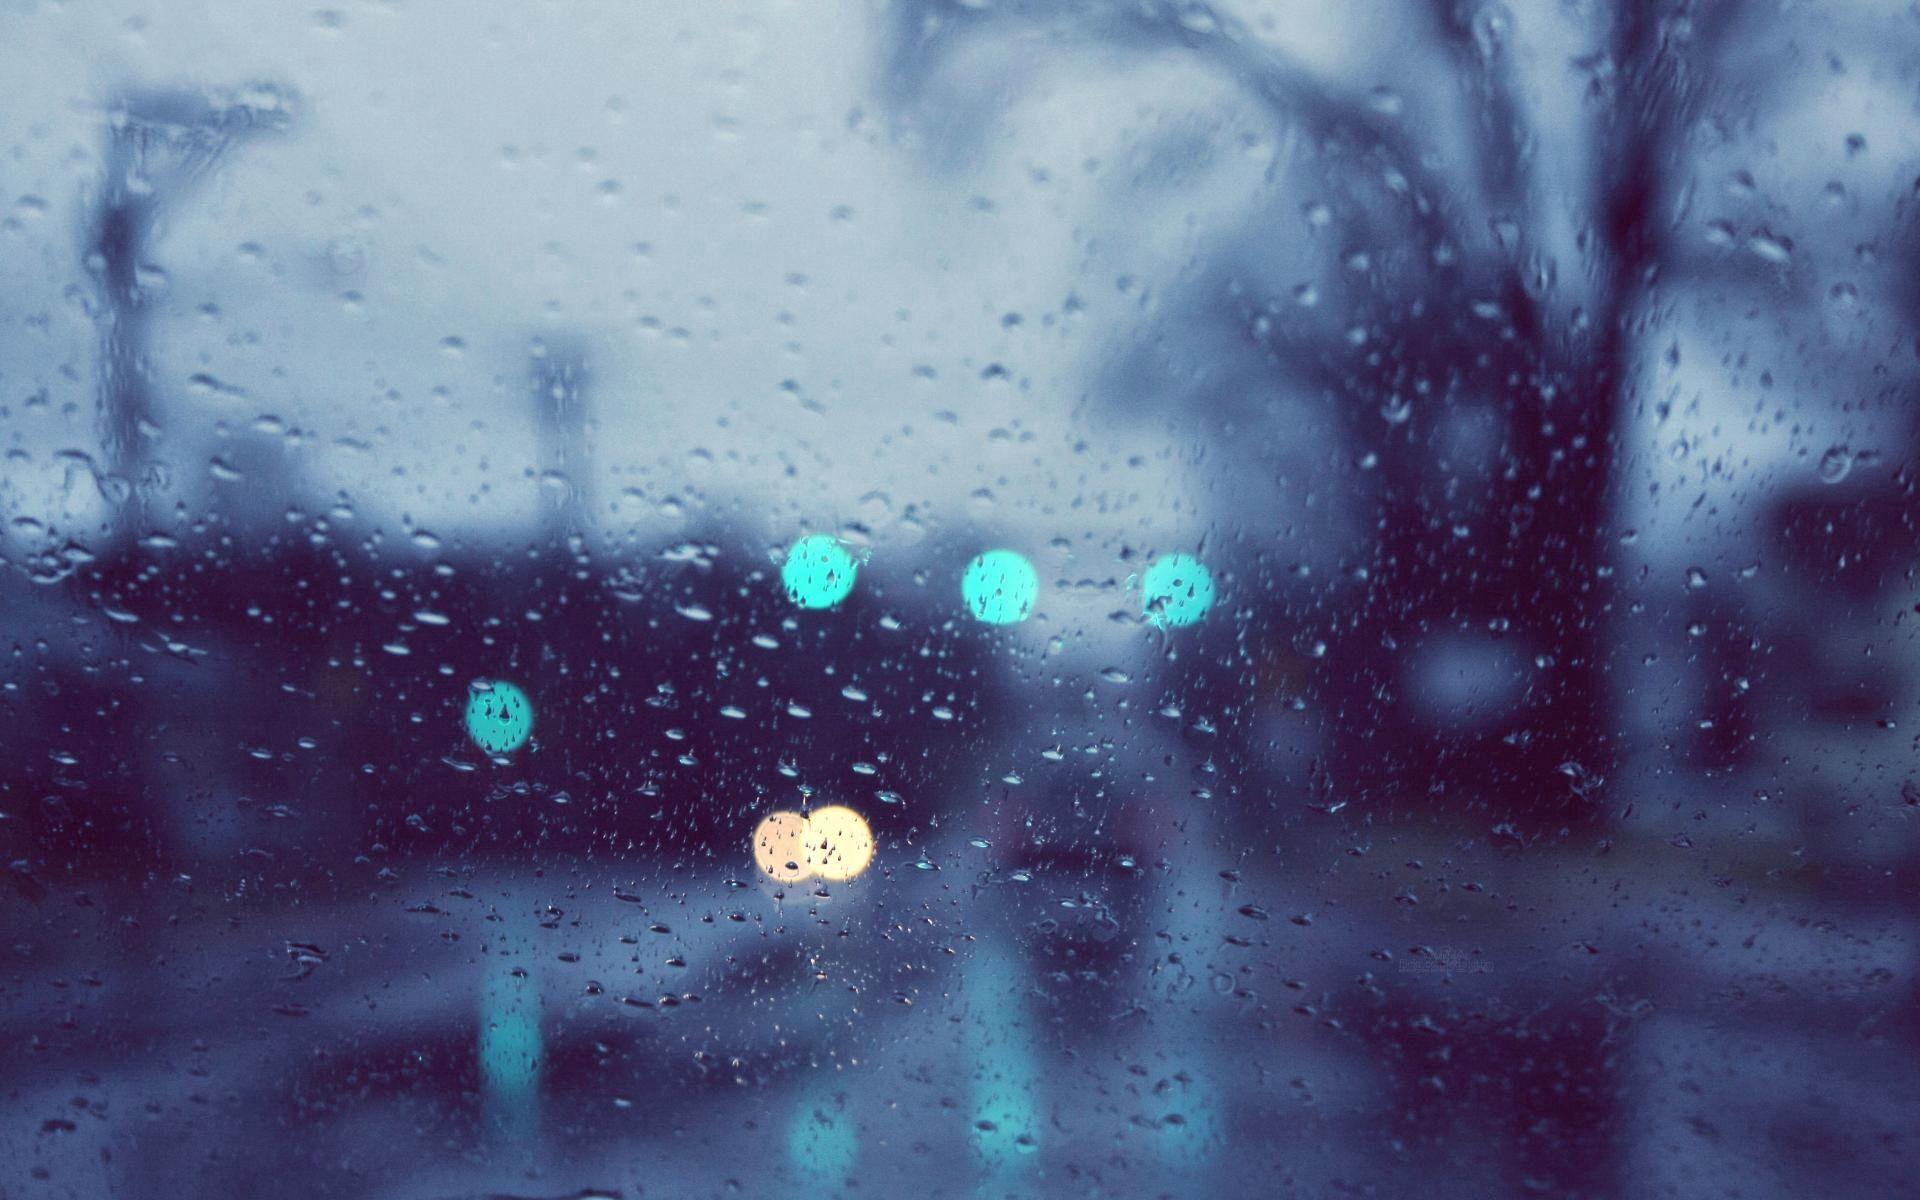 139230 download wallpaper Miscellanea, Miscellaneous, Rain, Glare, Glass, Drops screensavers and pictures for free